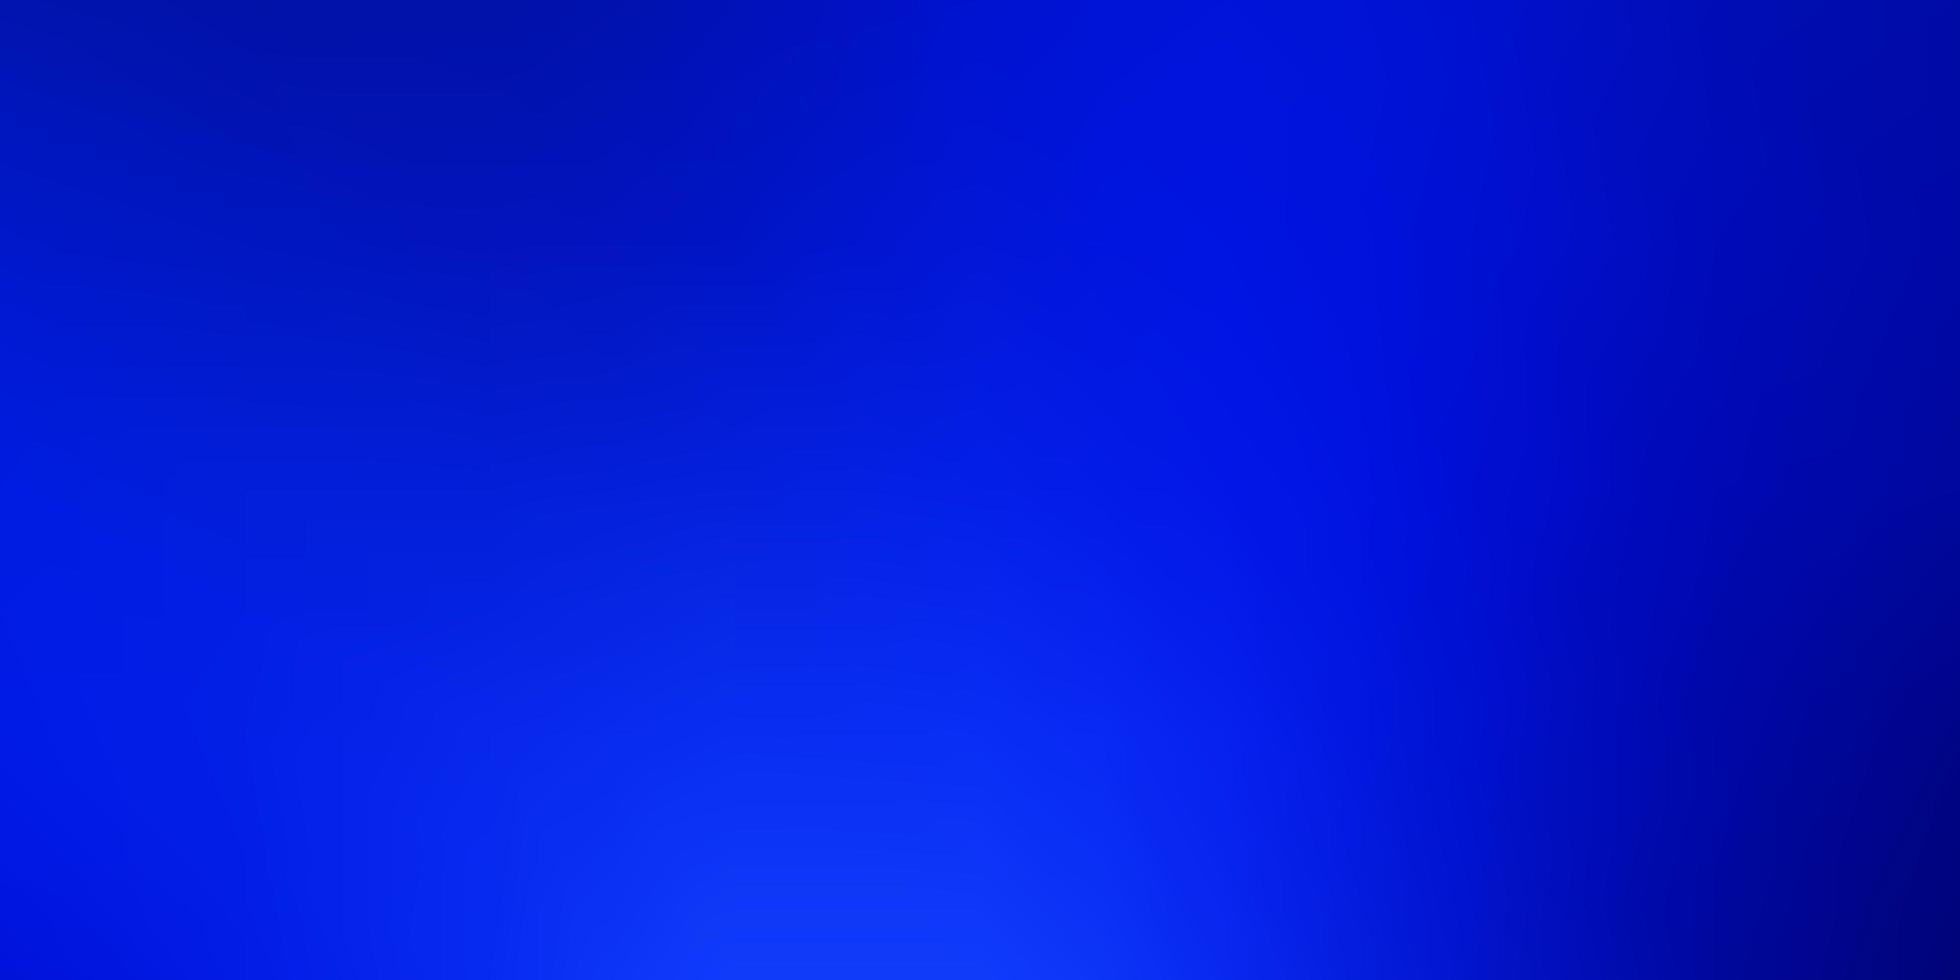 Dark BLUE vector smart blurred template.